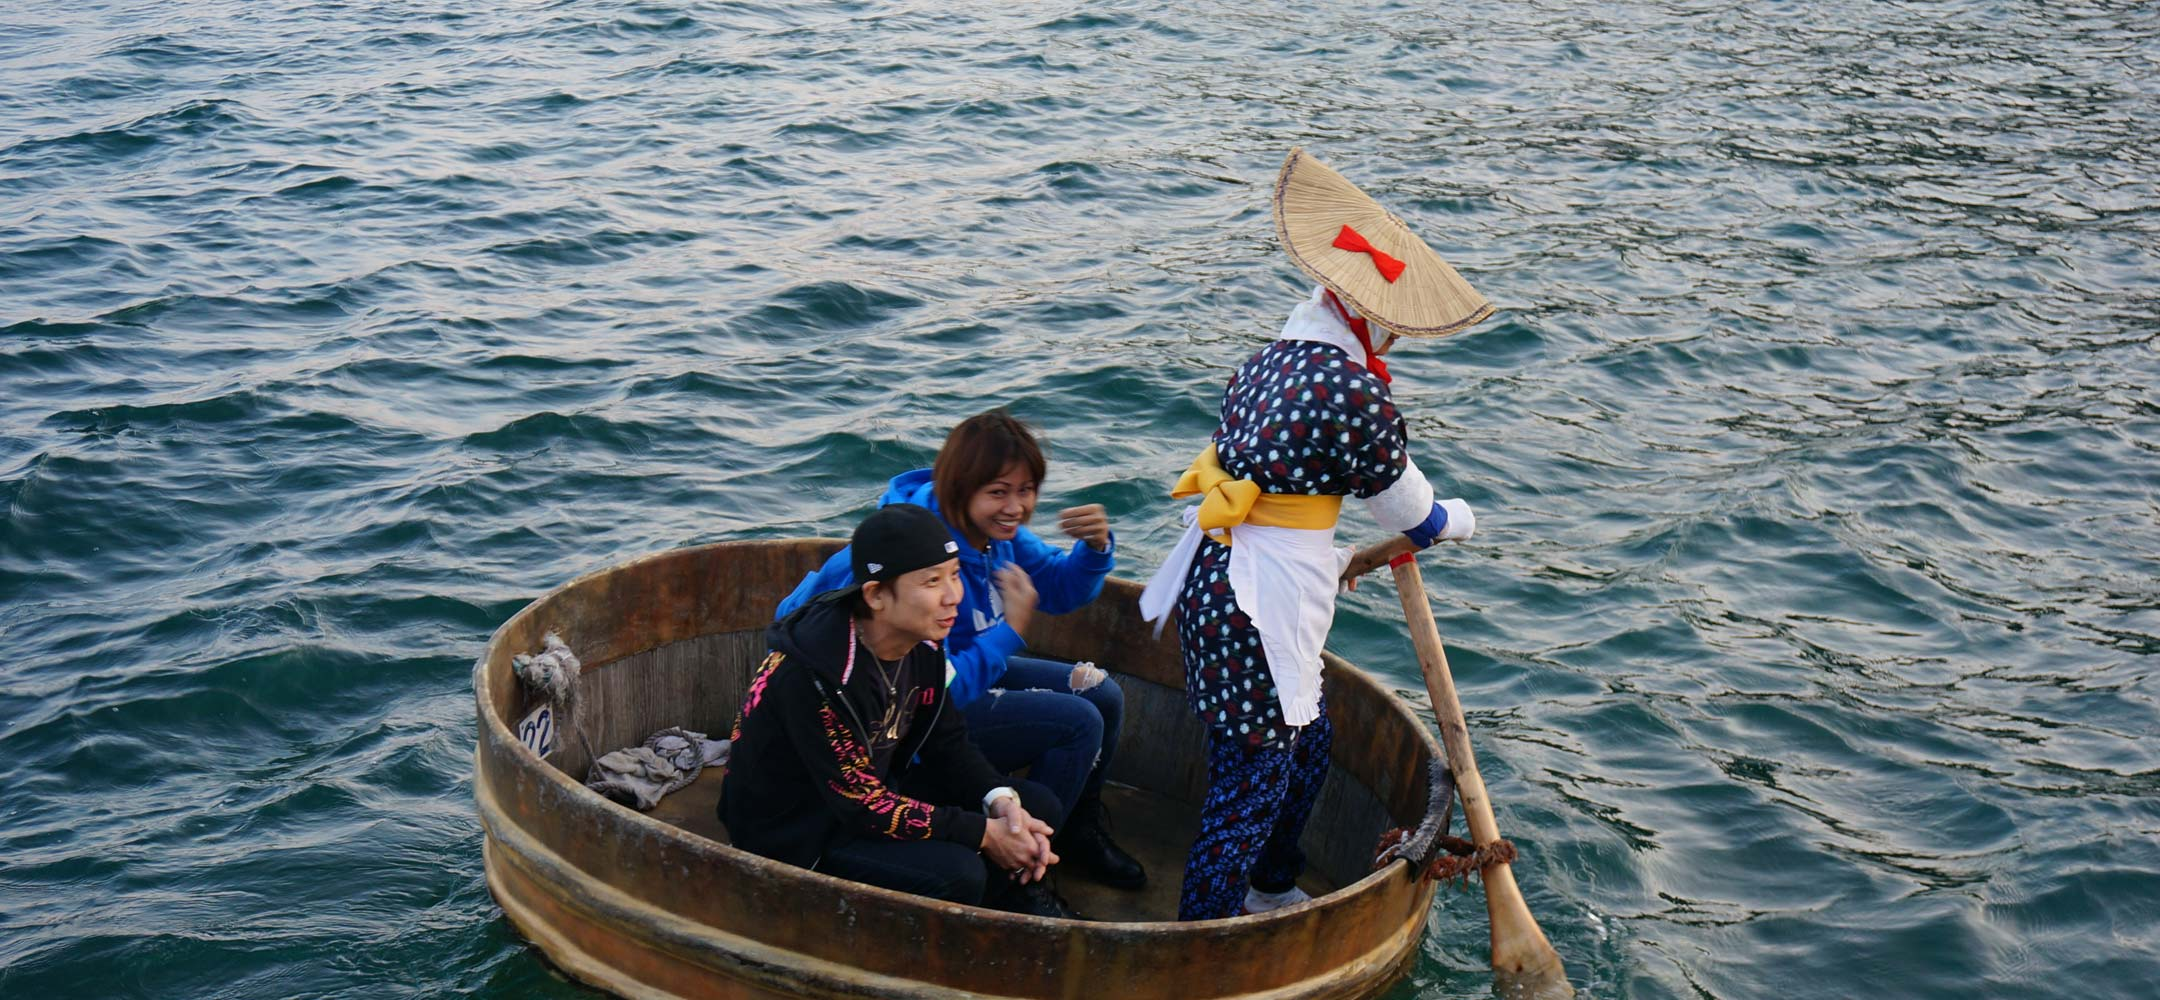 Sado Japan  city pictures gallery : Sado Island, Chubu | Inside Japan Tours